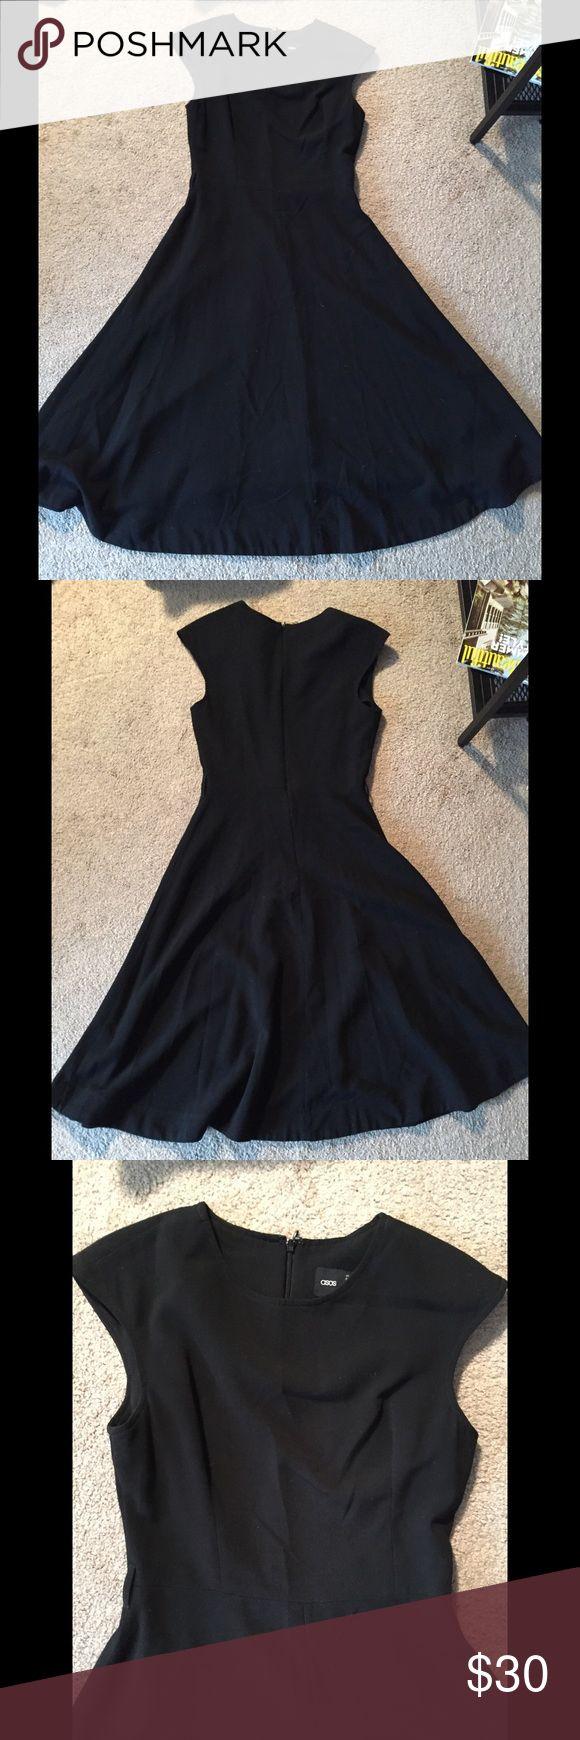 "Asos black dress ASOS black long dress. Size 8, length 45"", armpit to armpit 16"", waist 14.5"". Back zipper closure. Great condition ASOS Dresses Midi"